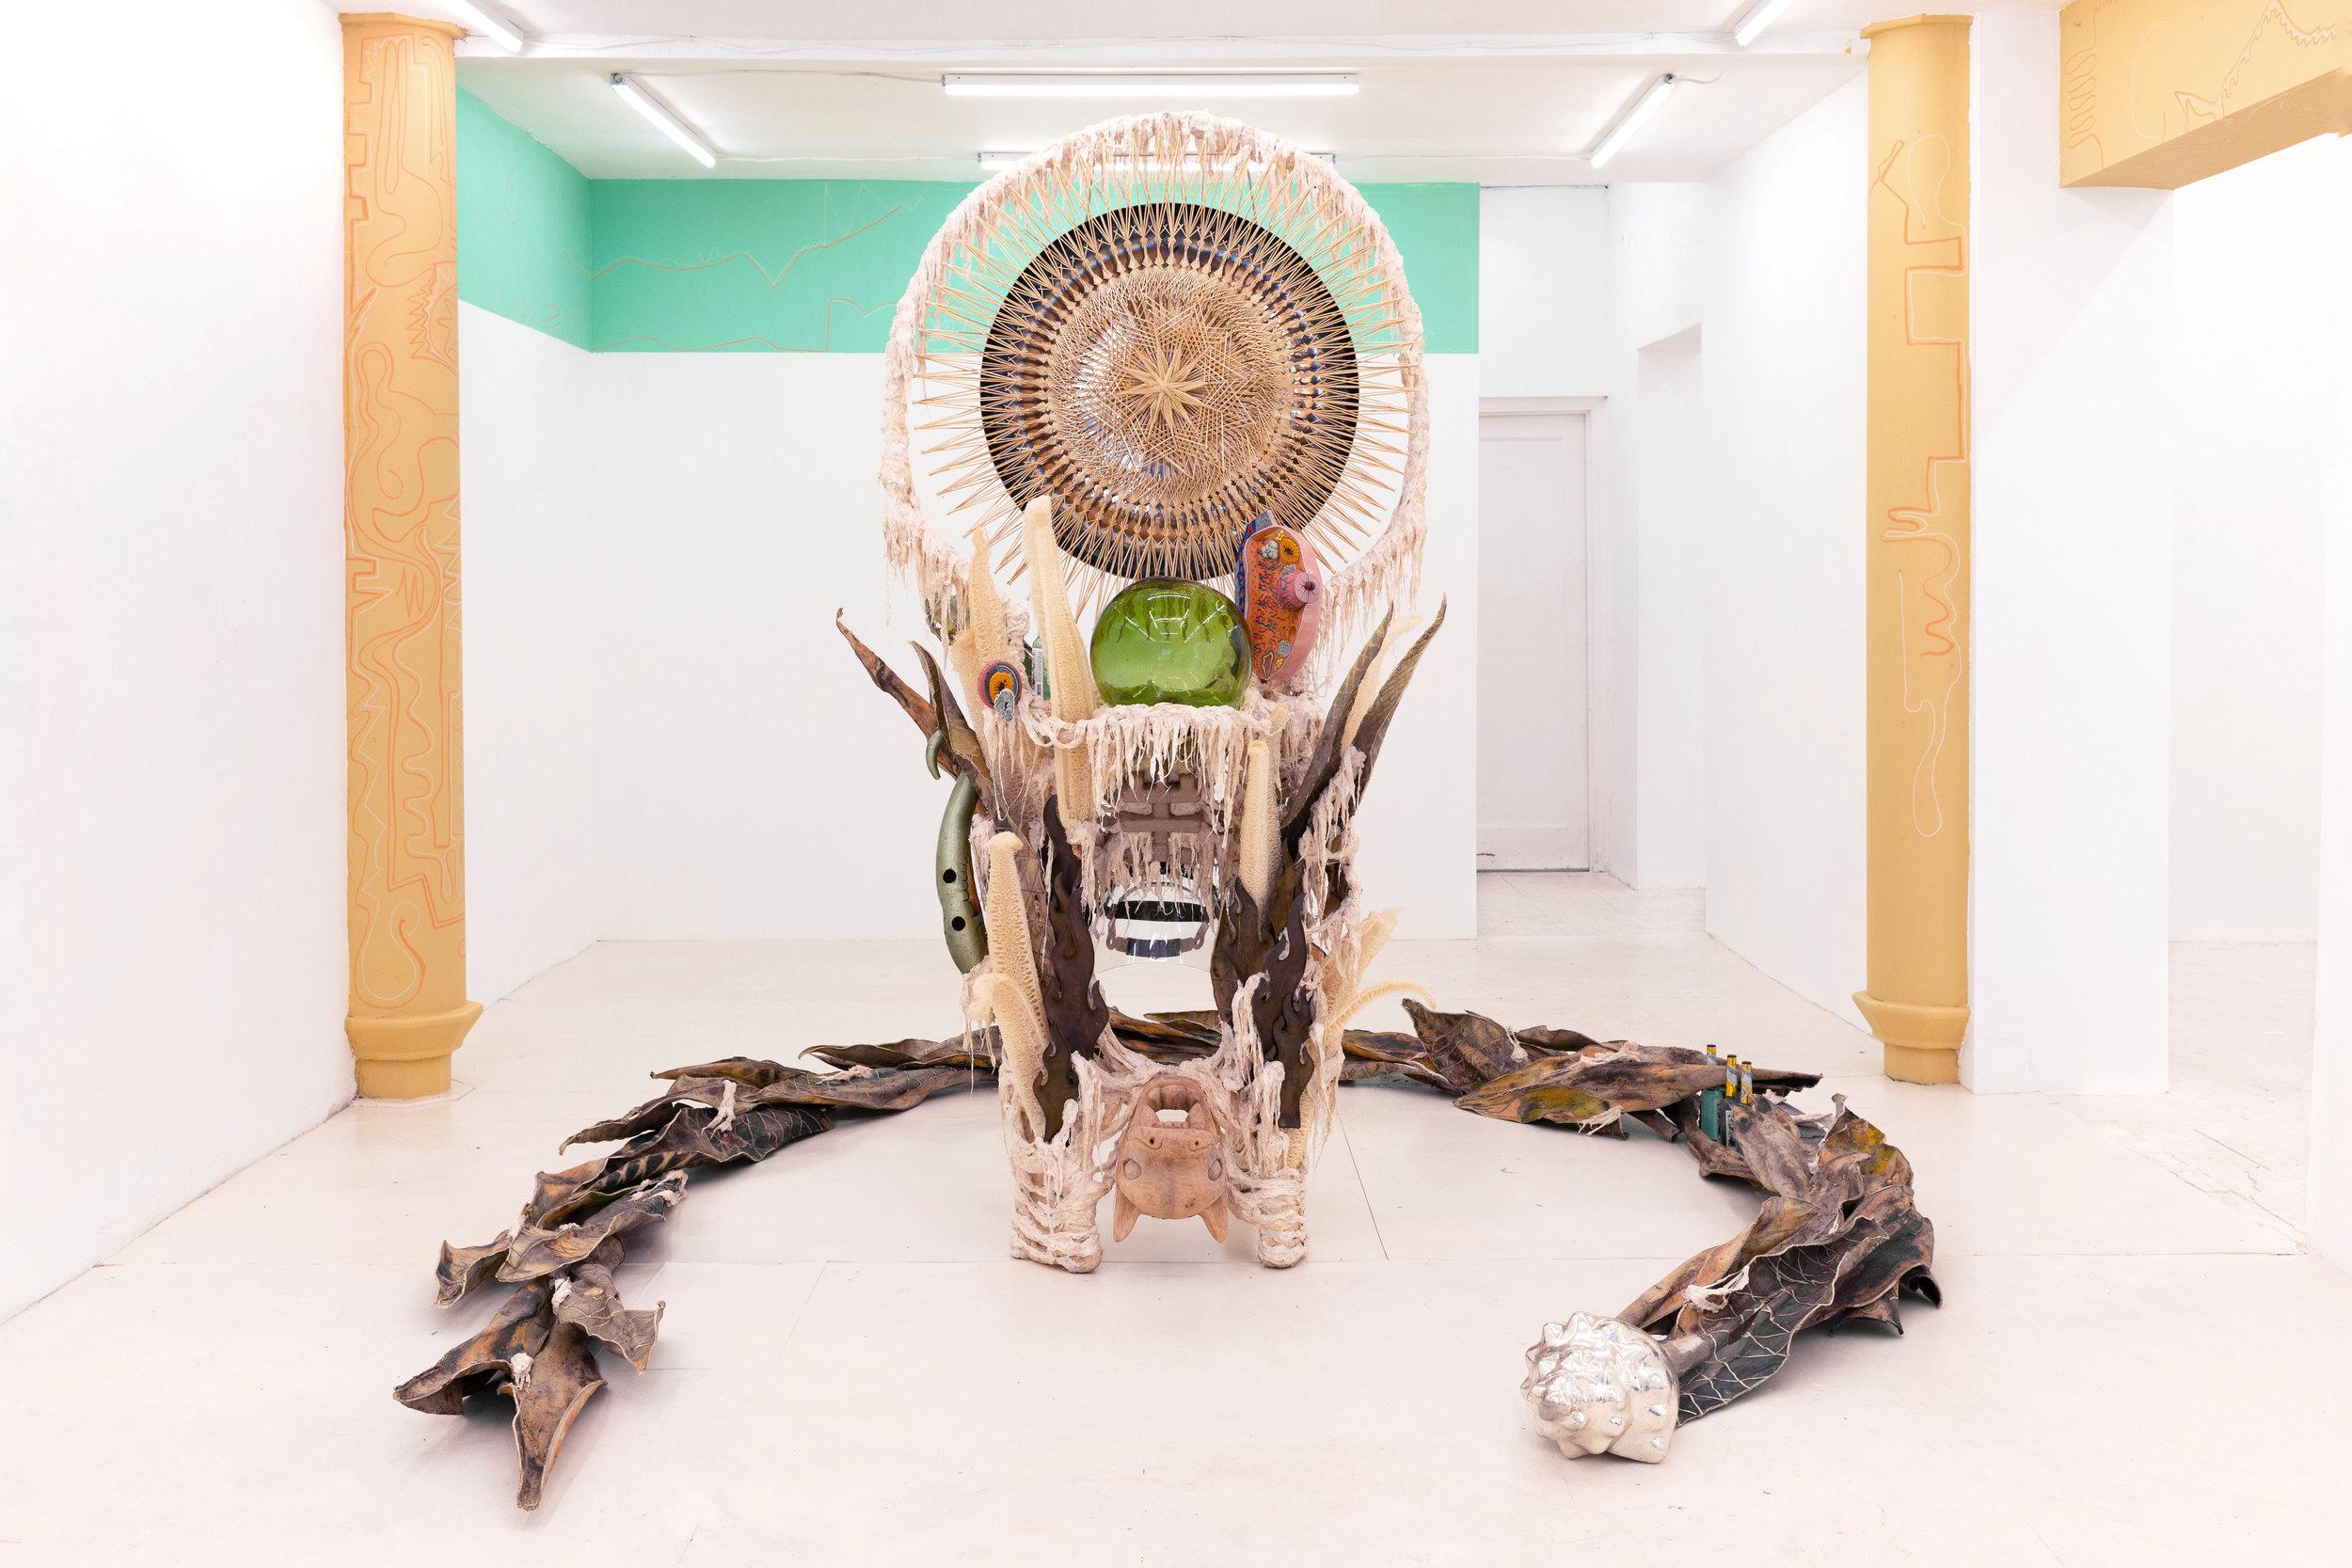 Guadalupe Maravilla   Disease Thrower #5,  2019 Mixed media sculpture/shrine/instrument/headdress  91 x 55 x 45 inches